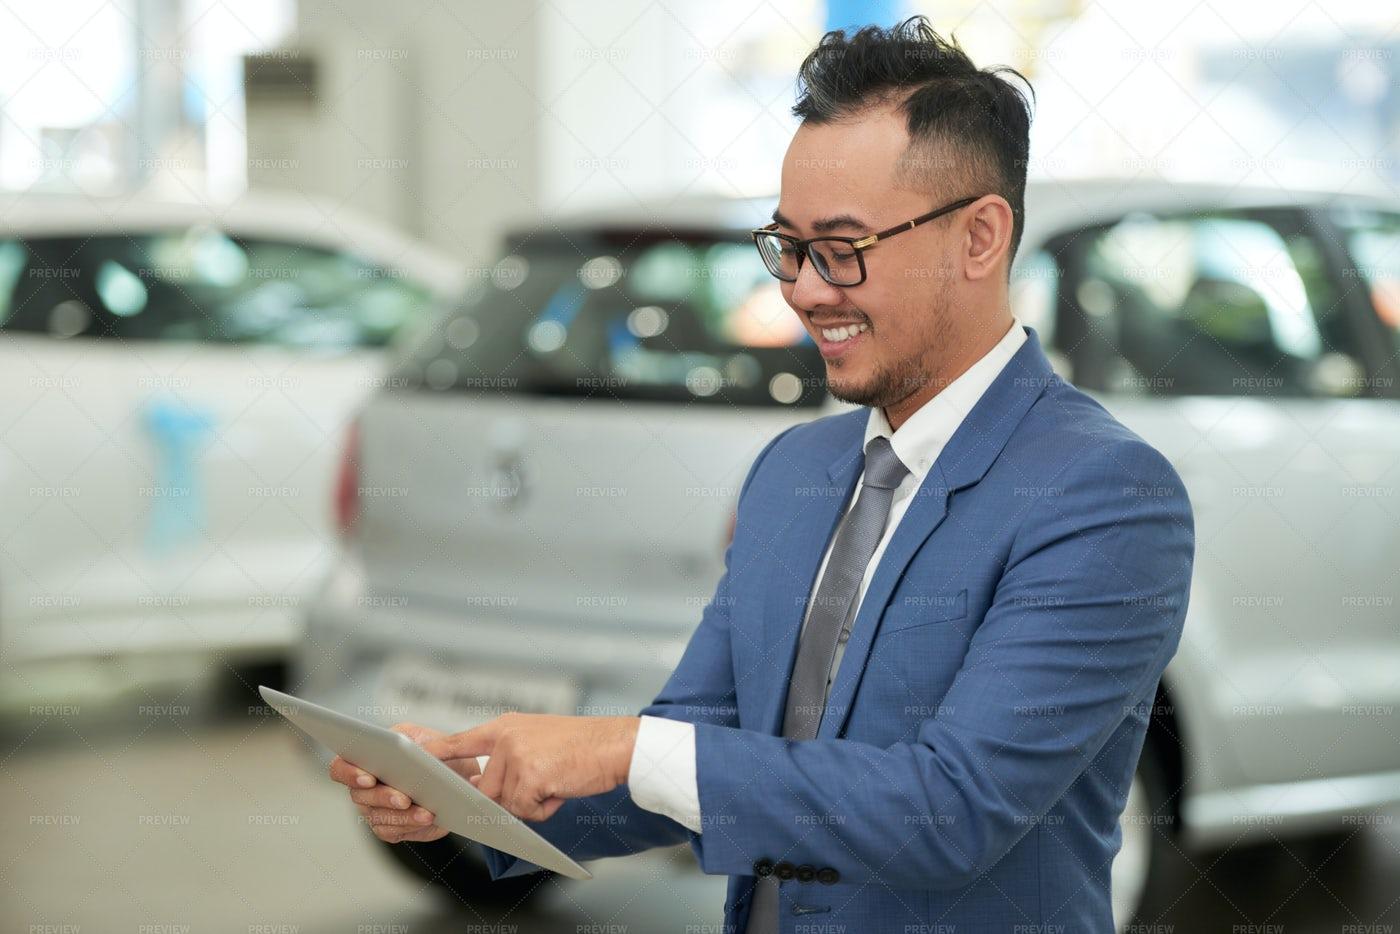 Salesman Using Tablet Pc In Car Salon: Stock Photos